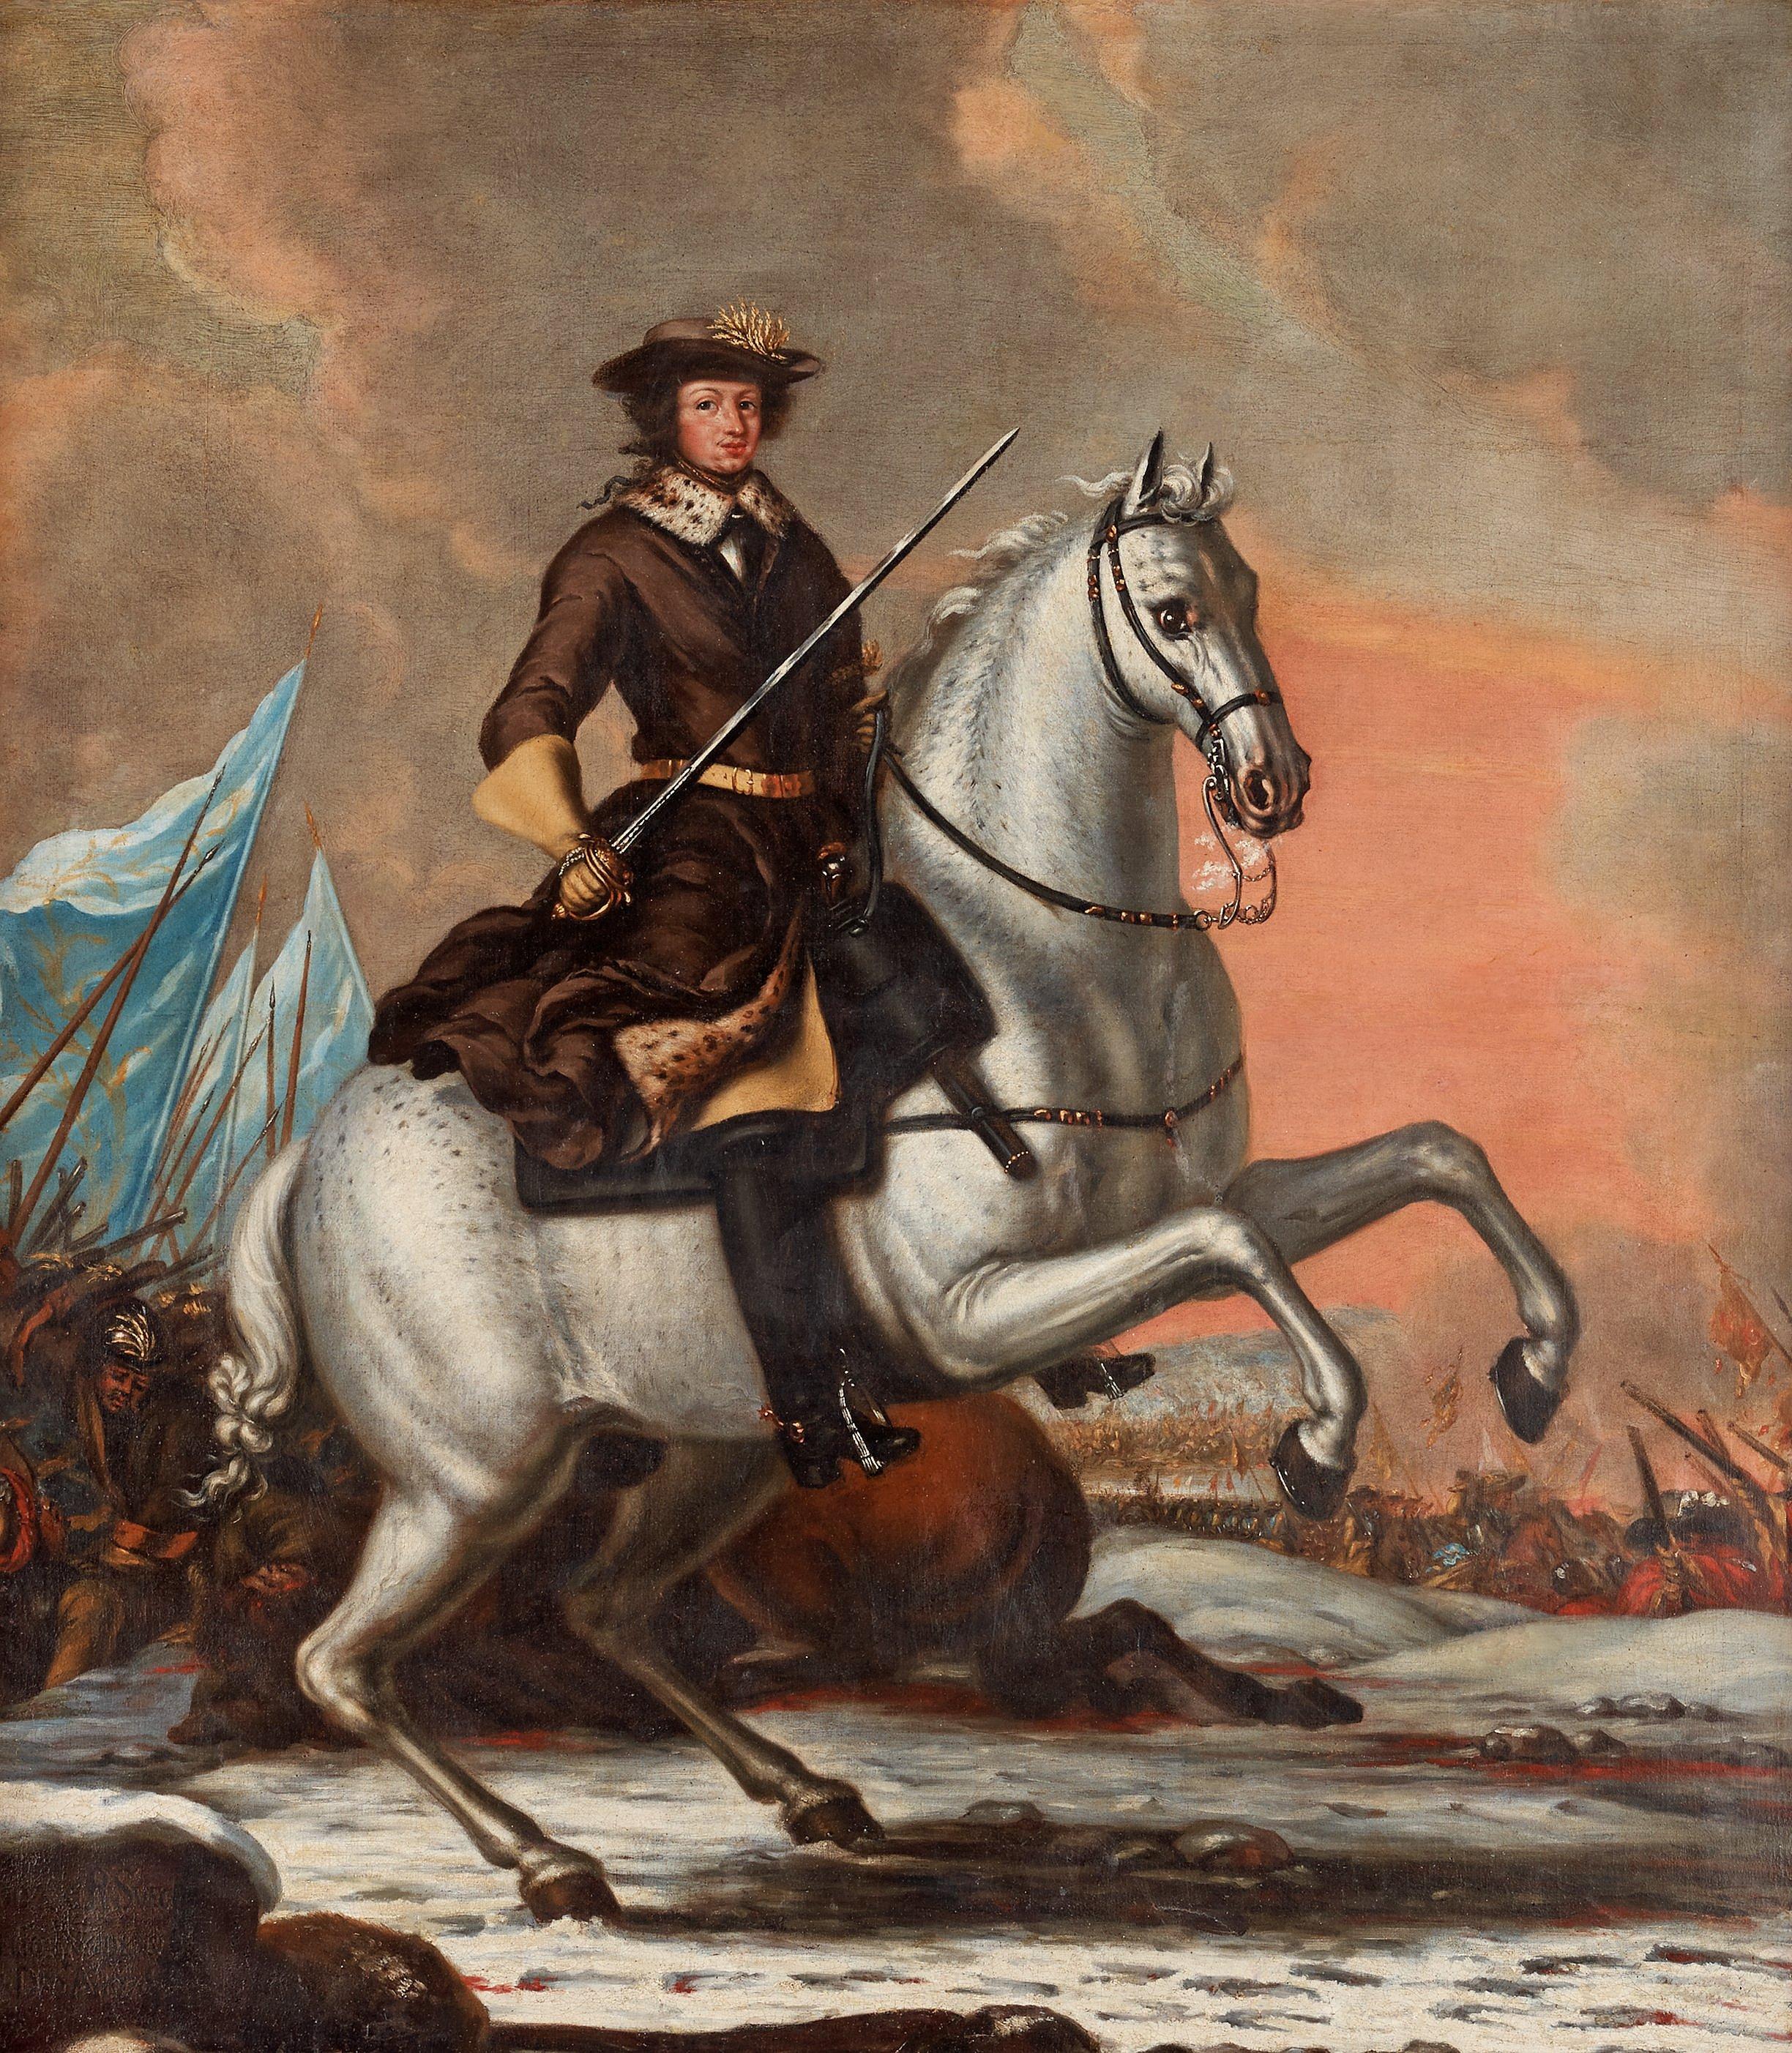 DAVID KLÖCKER EHRENSTRAHL His studio, King Charles XI (1655-1697) at the  battle of Lund 1676. - Bukowskis